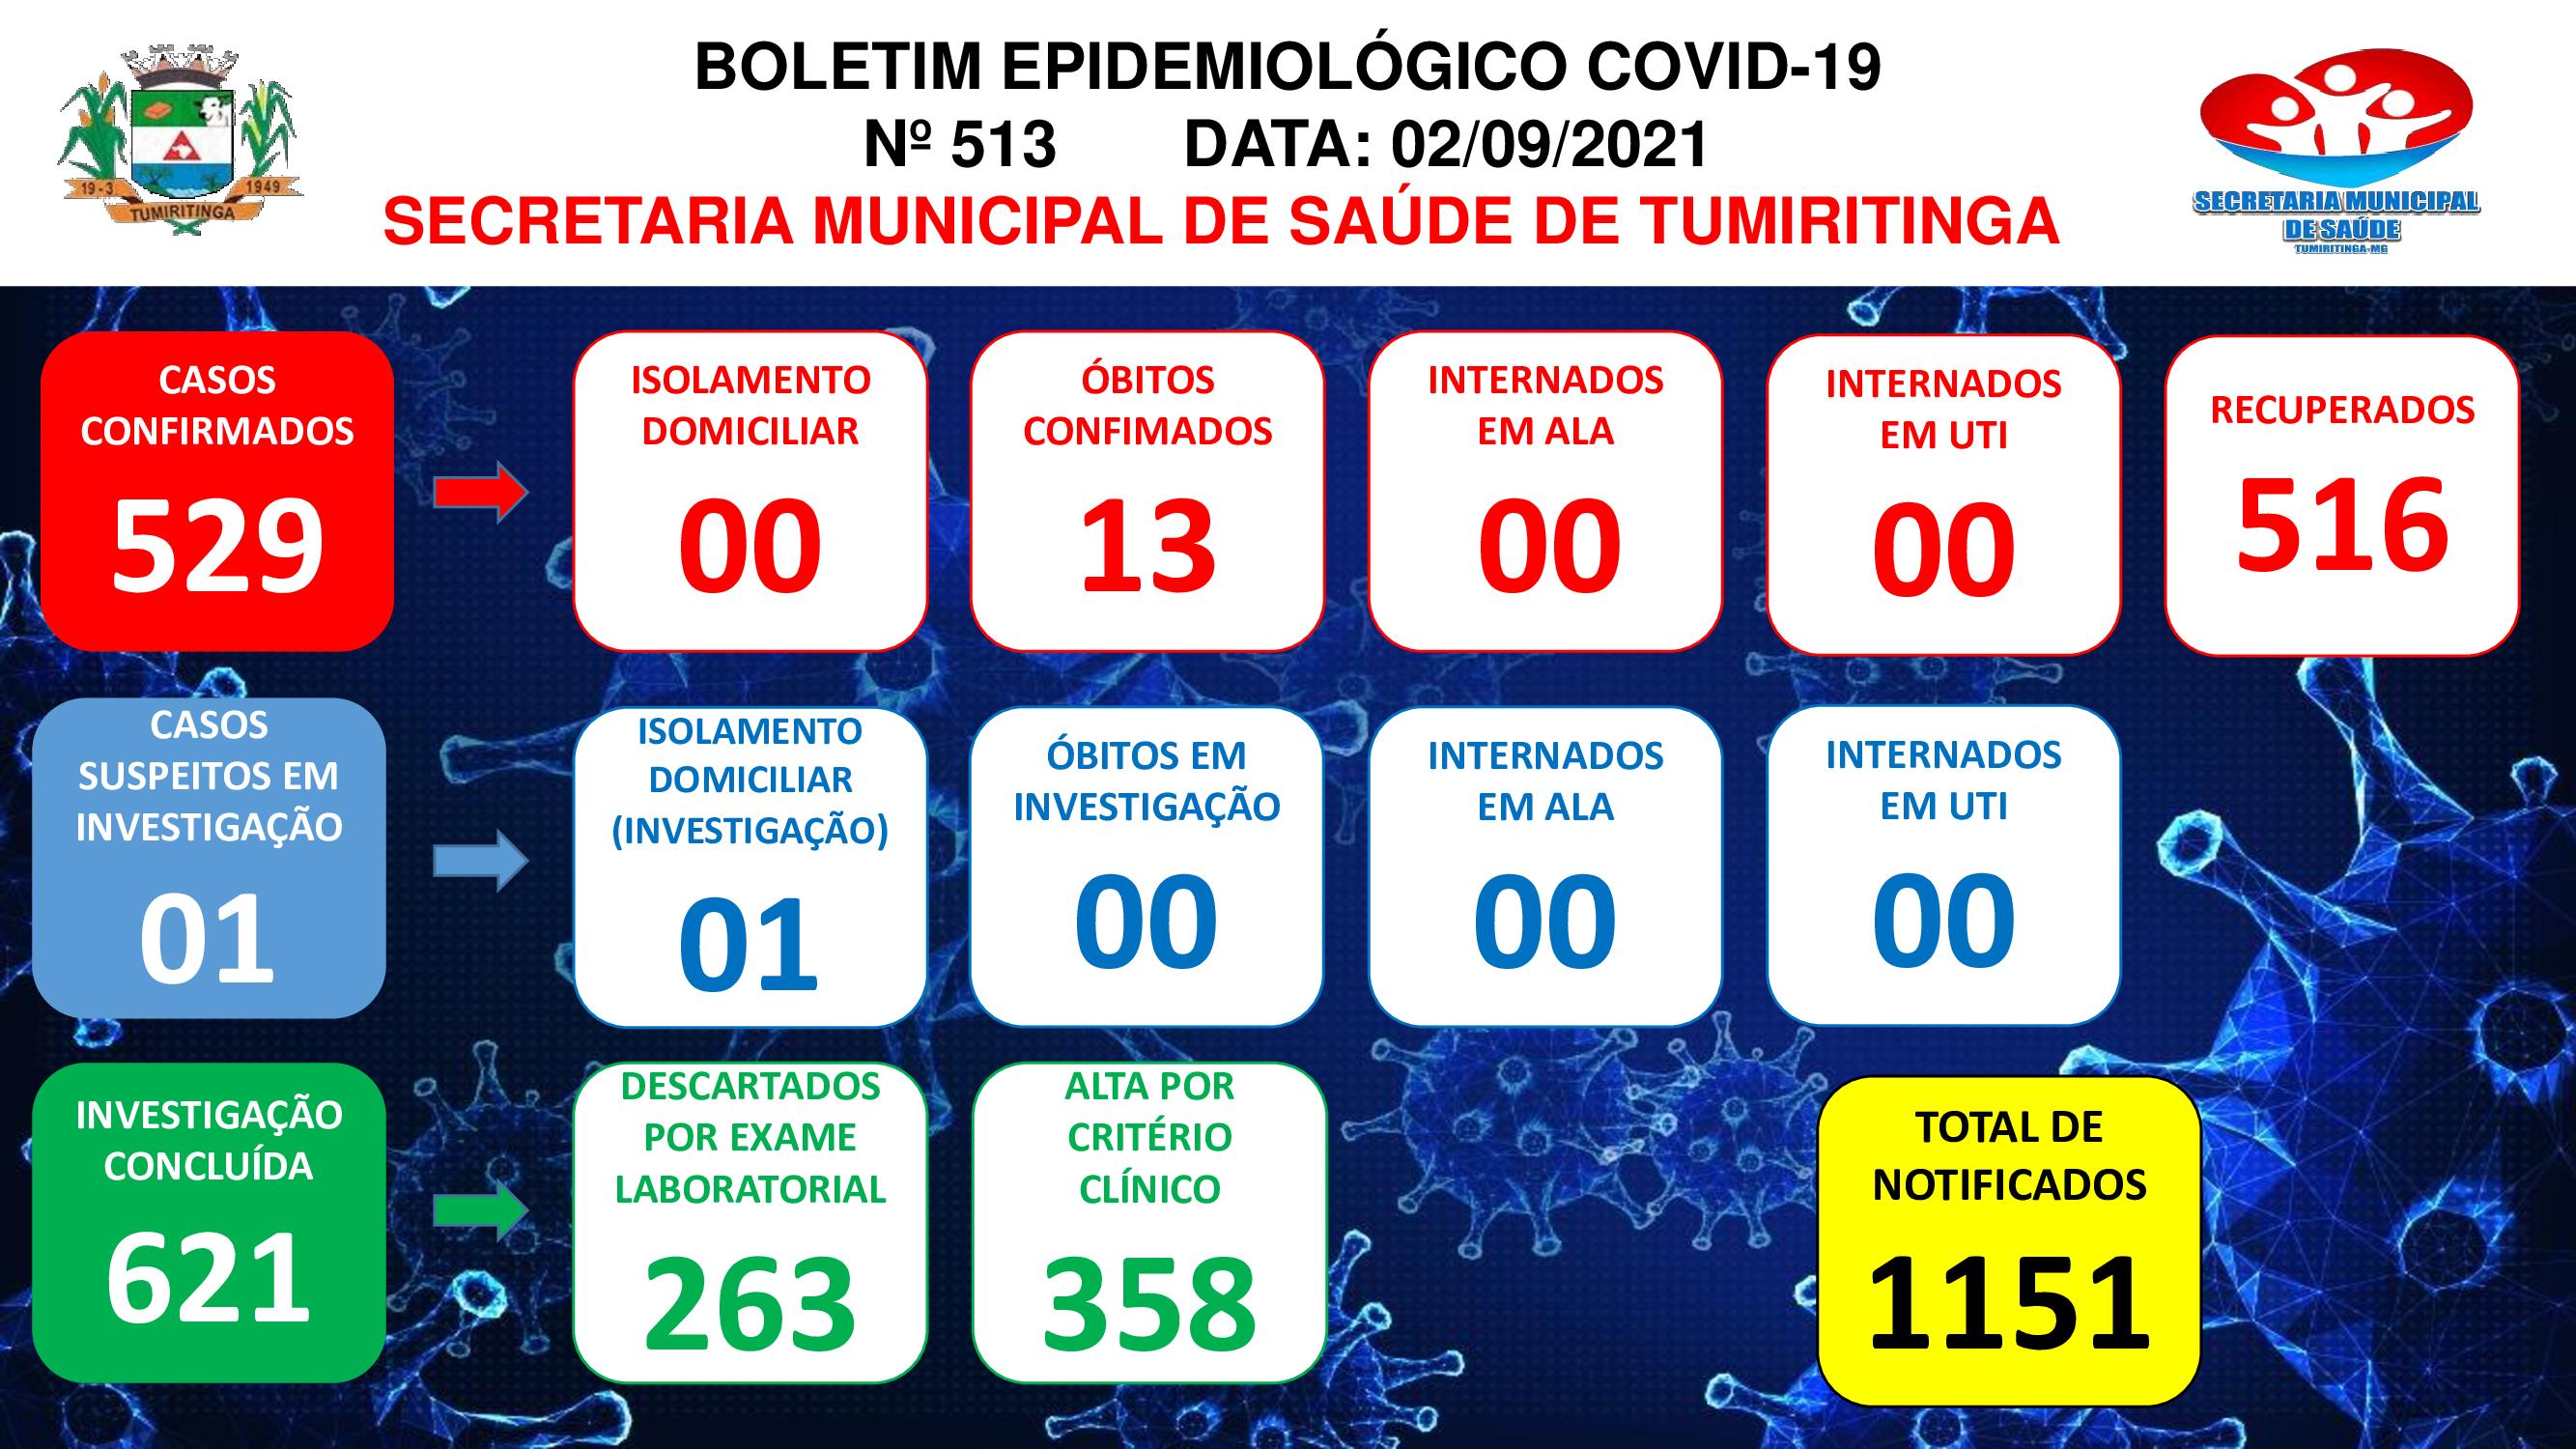 BOLETIM EPIDEMIOLÓGICO CORONAVÍRUS N° 513 - 02/09/2021